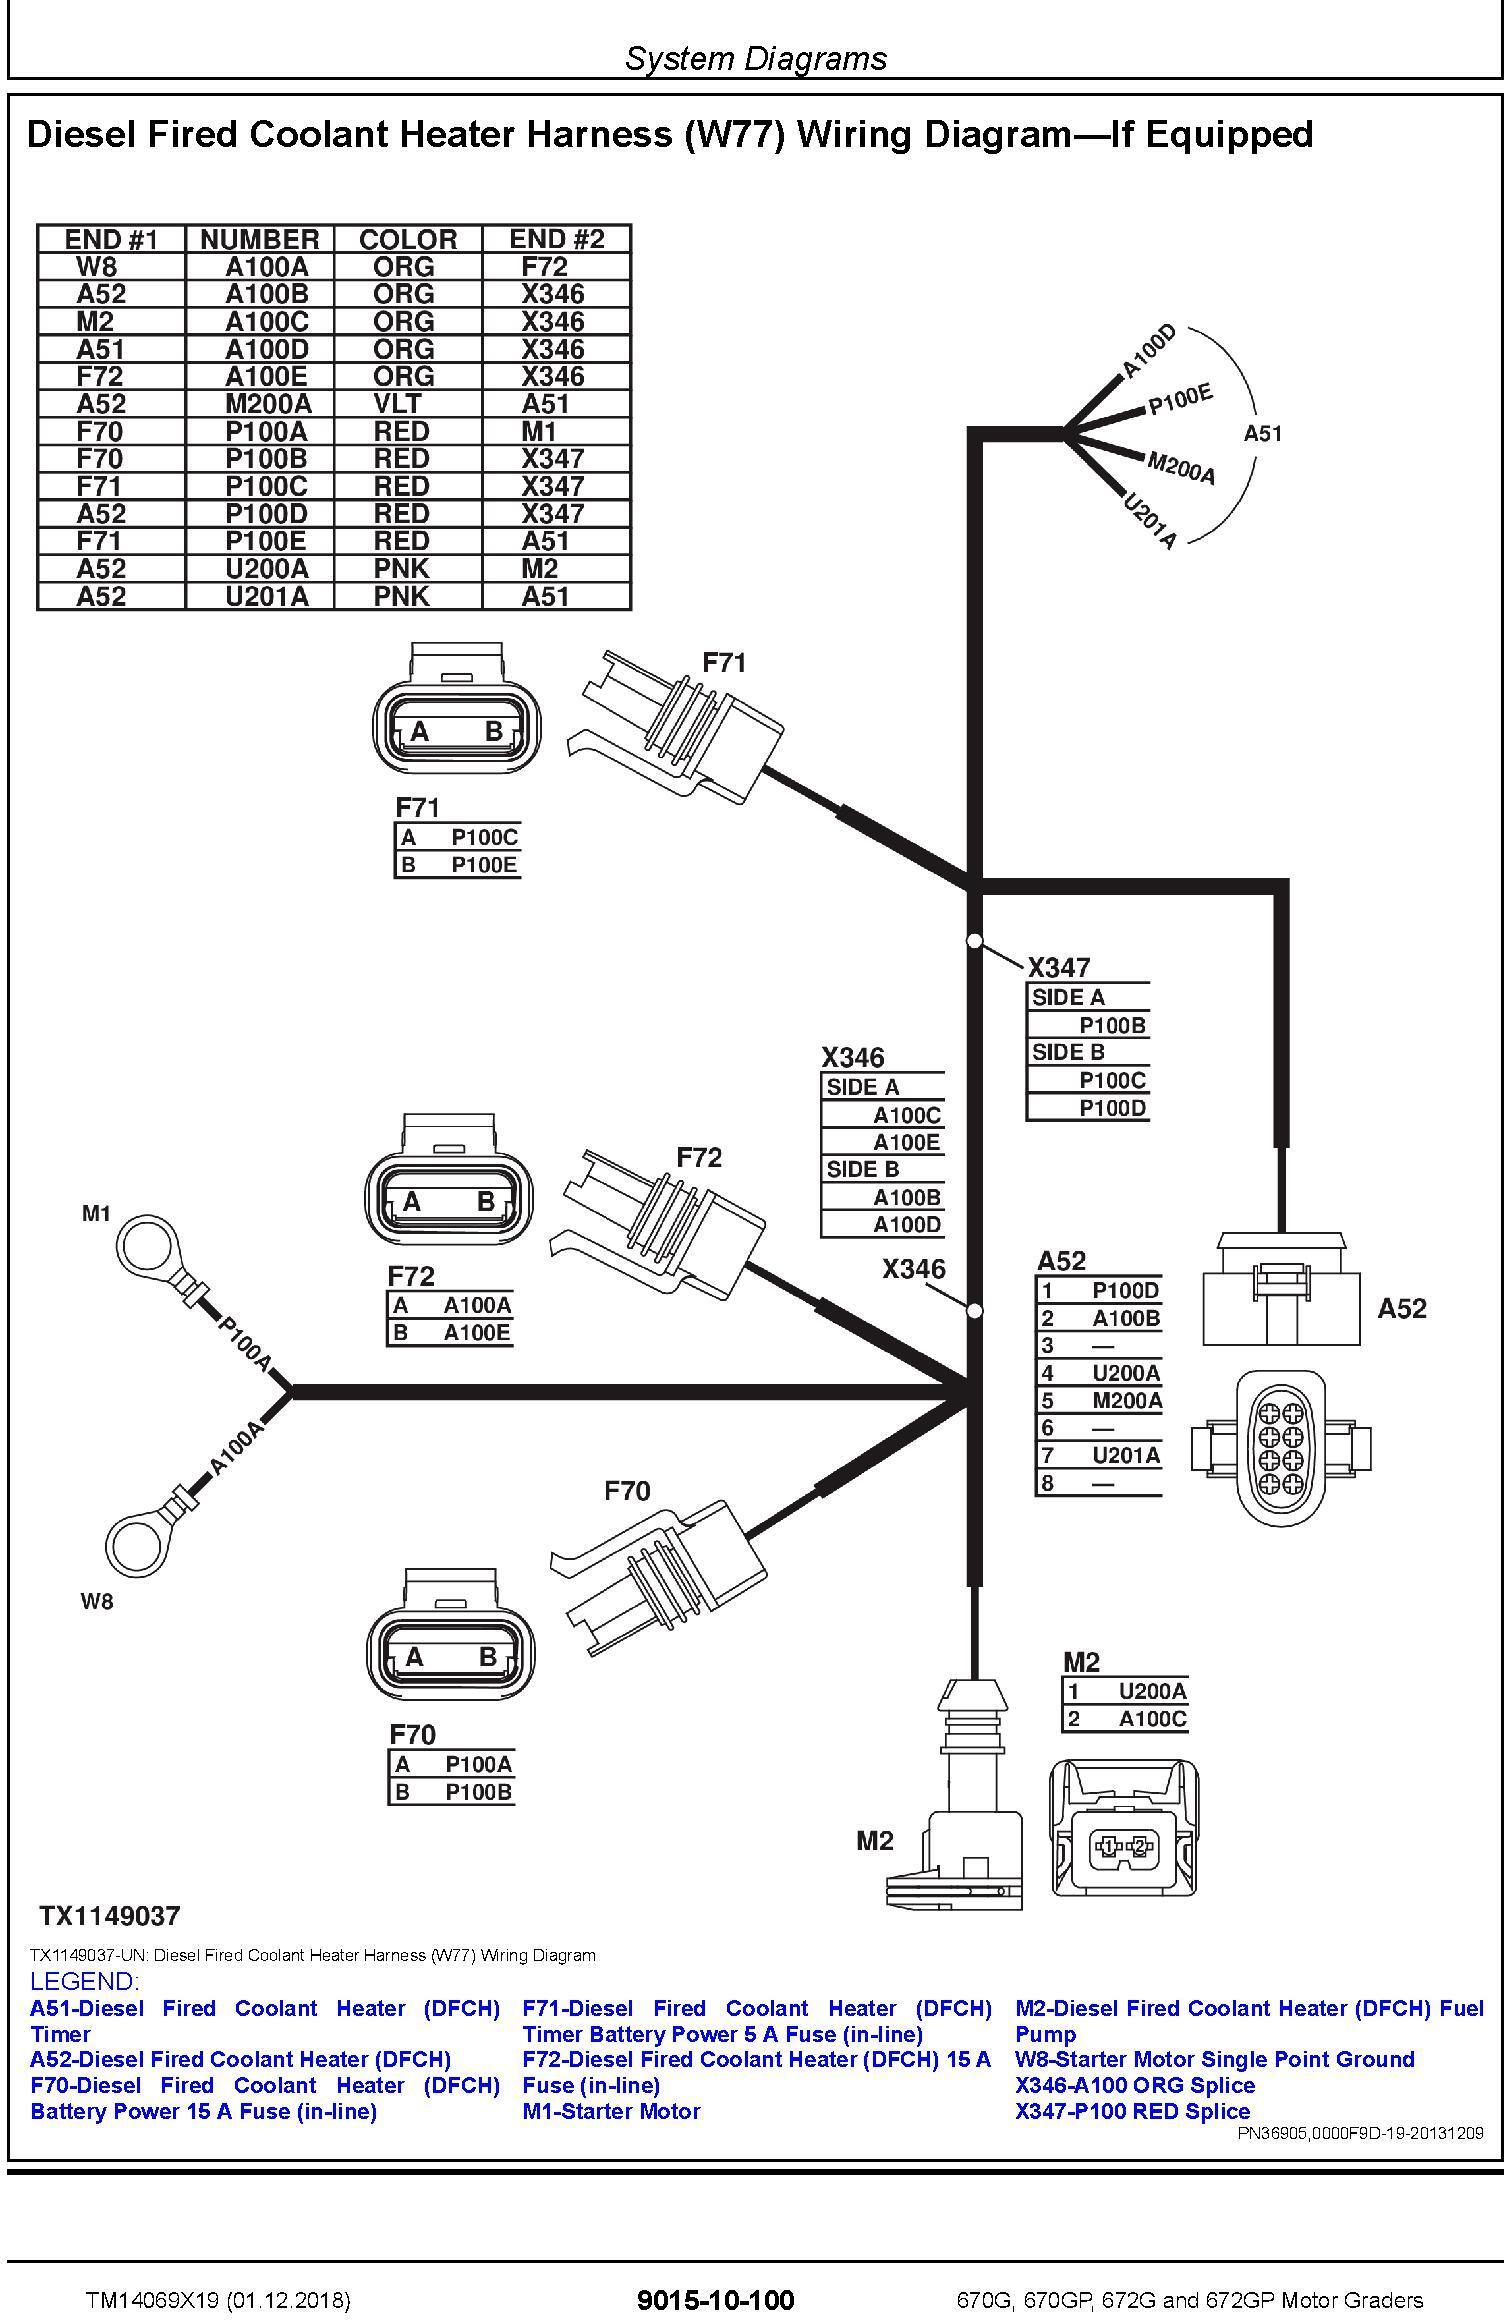 John Deere 670G, 670GP, 672G and 672GP Motor Graders Operation & Test Technical Manual (TM14069X19) - 2